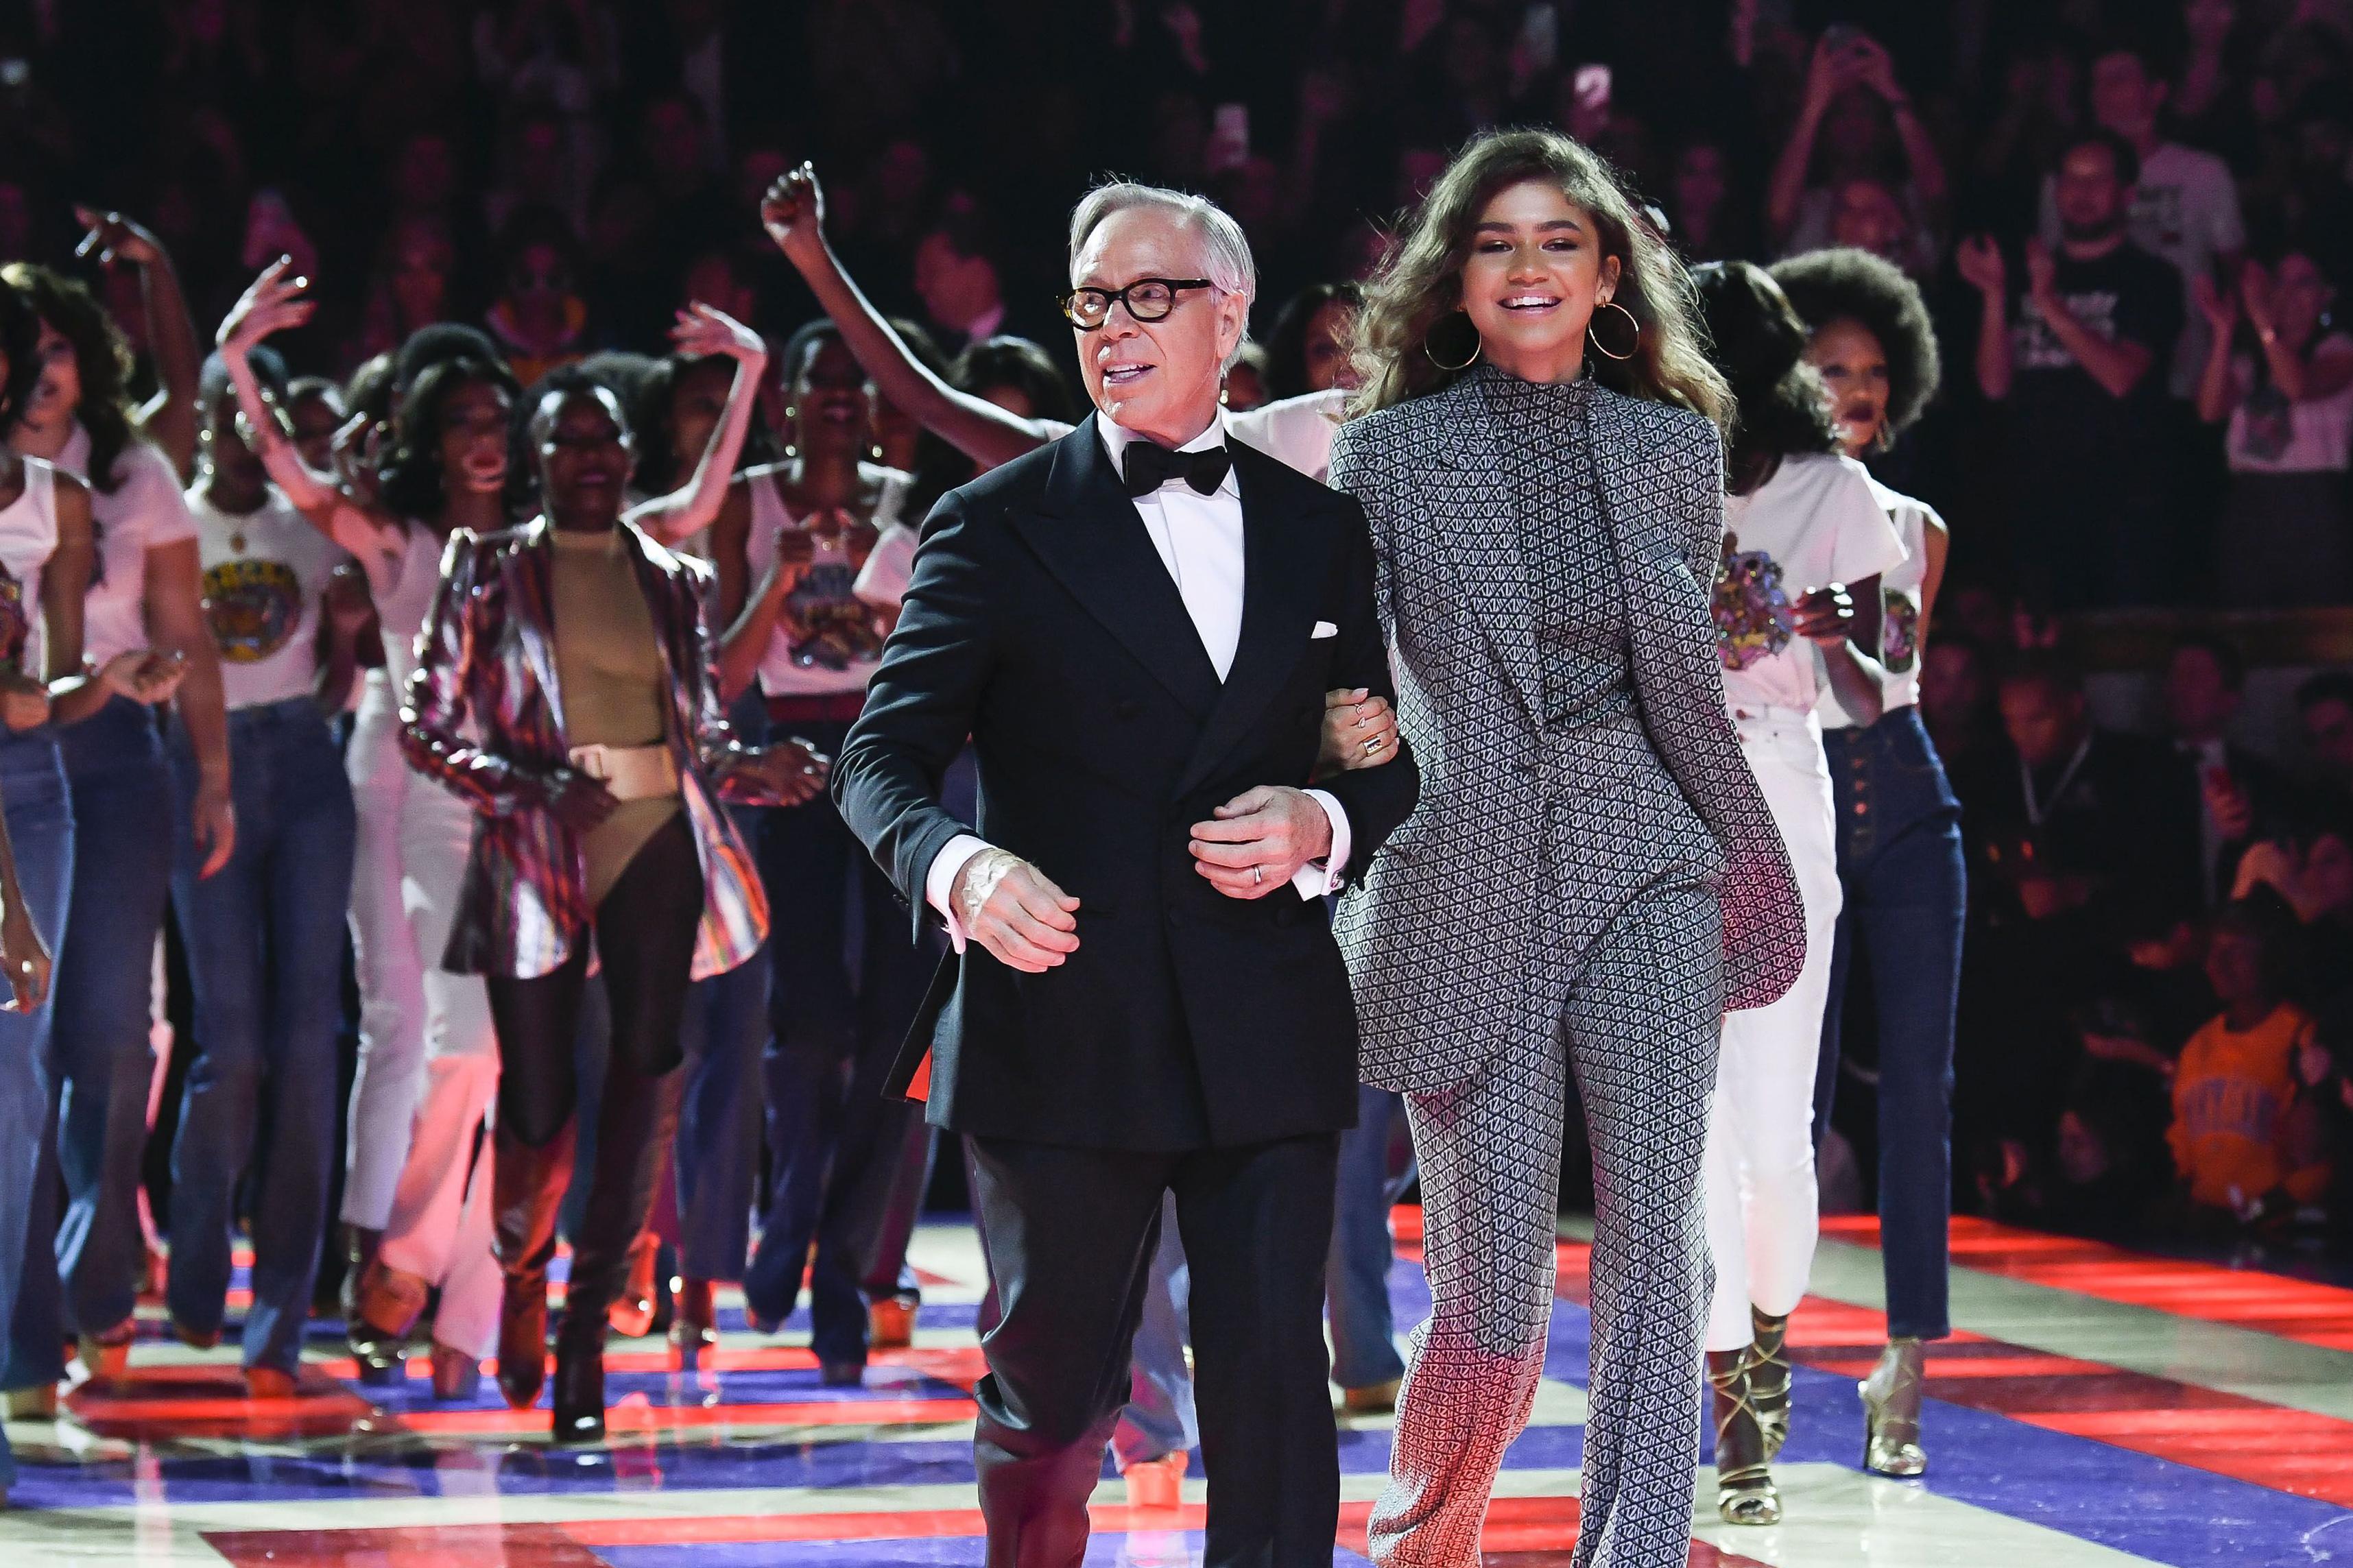 Zendaya, Tommy Hilfiger and models on the catwalk